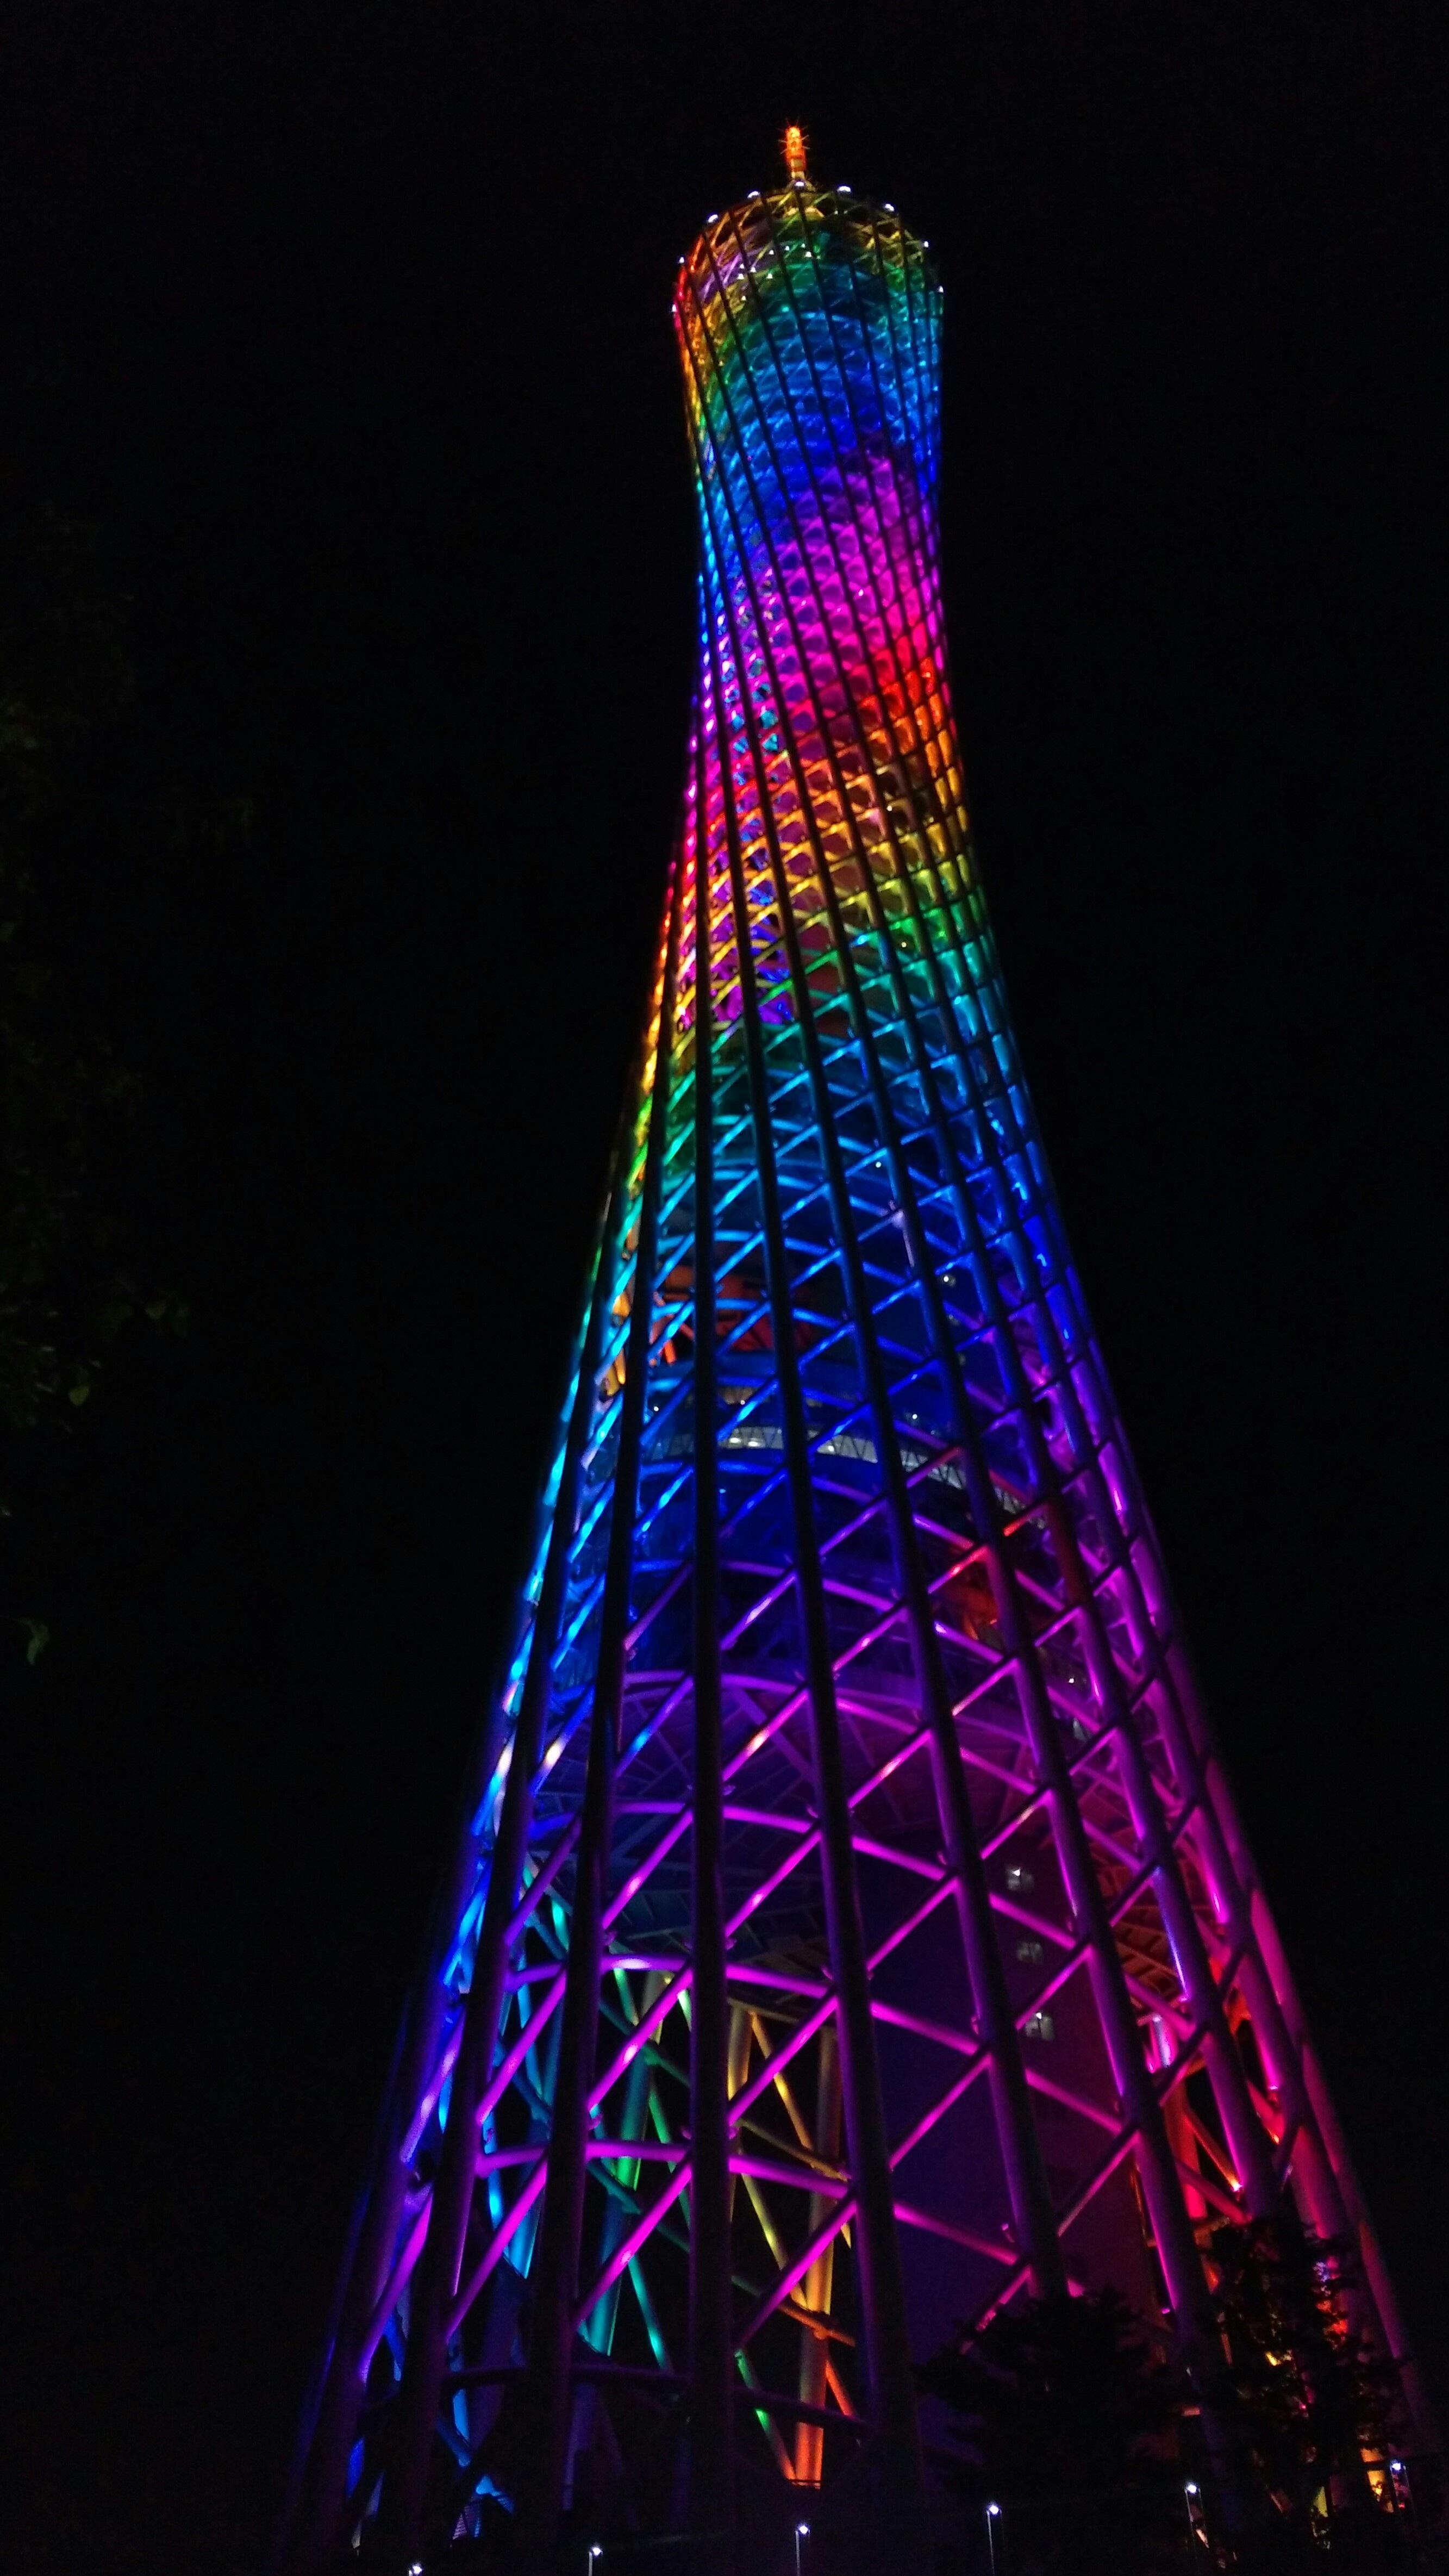 Light Night Tower Blue Lighting Christmas Tree Christmas Decoration Shape  Night View Christmas Lights Canton Tower